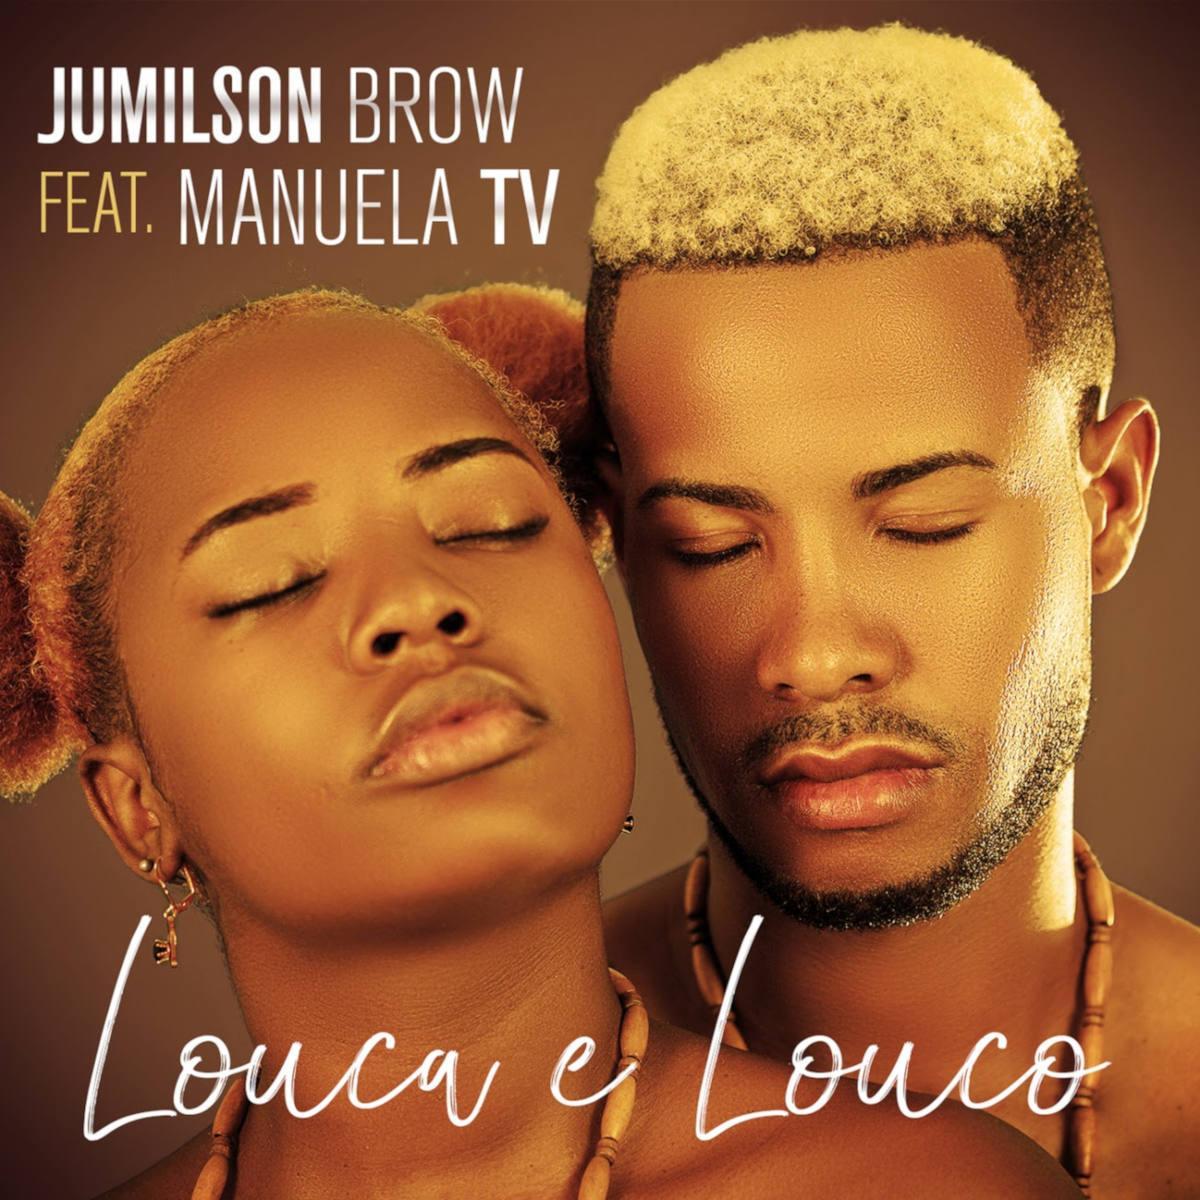 Jumilson Brow ft Manuela TV - Louca e Louco